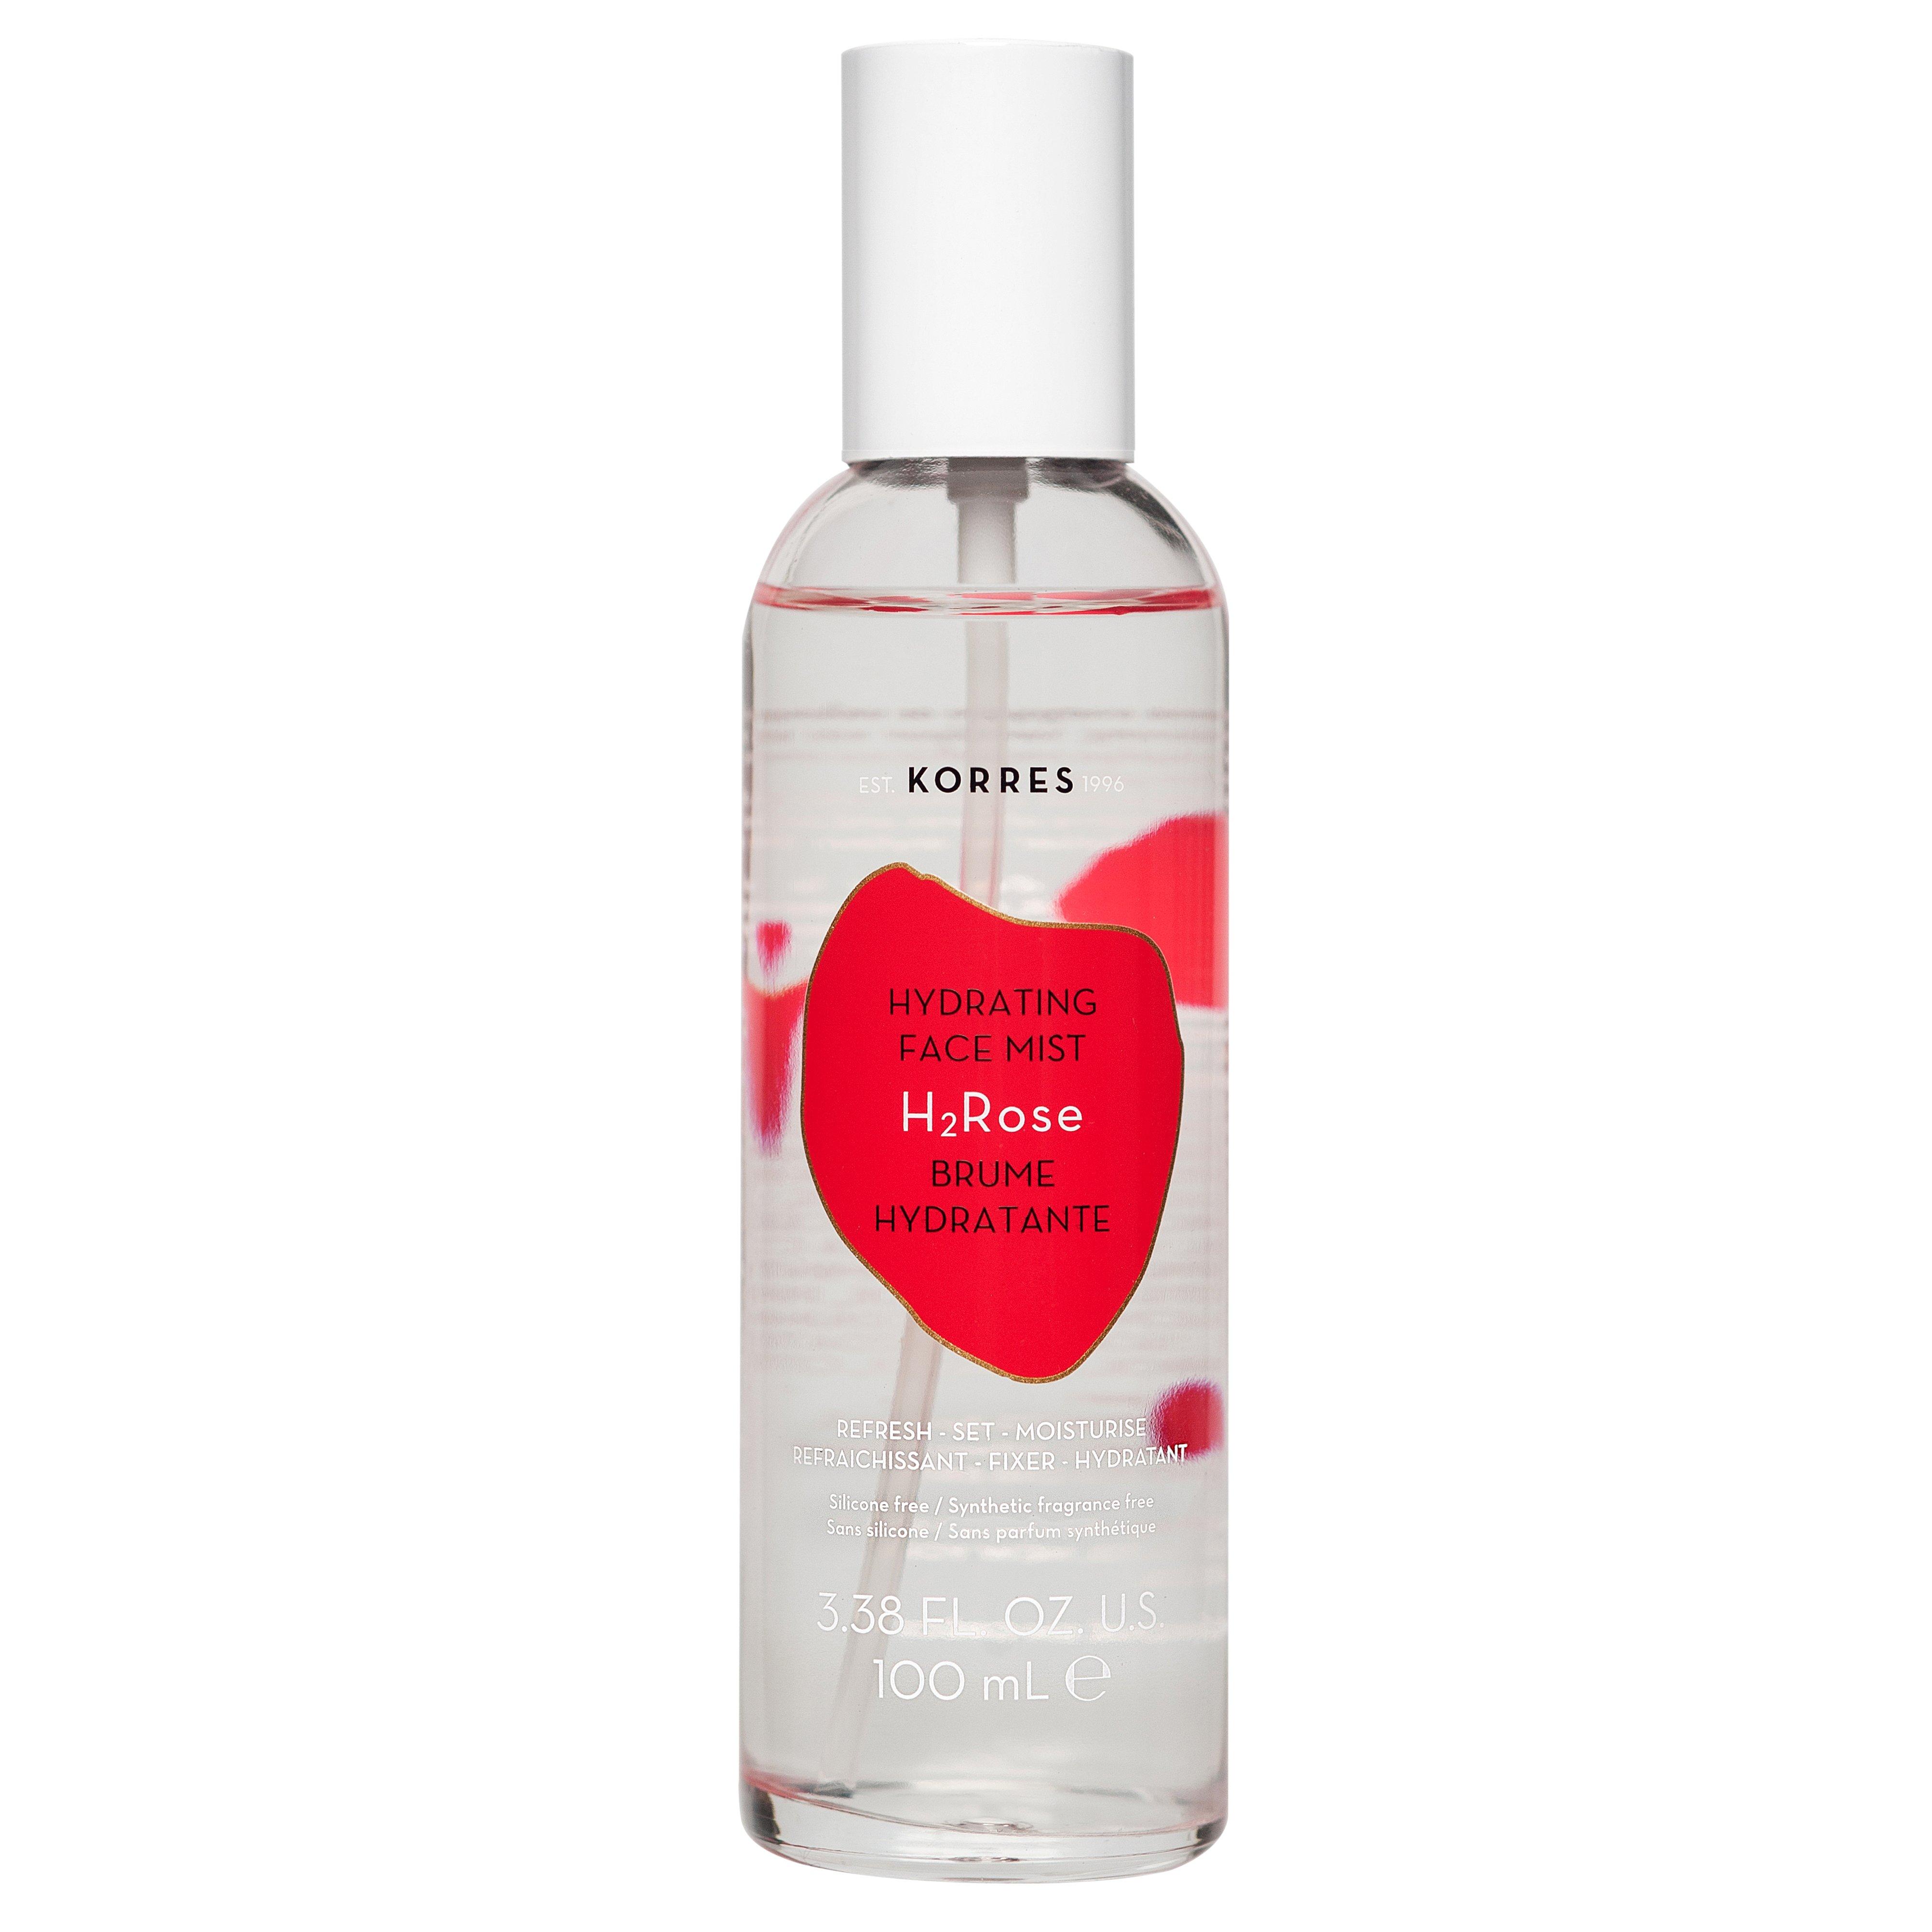 Korres Wild Rose Hydrating Face Mist Άγριο Τριαντάφυλλο Ενυδατικό Mist Προσώπου Super Λάμψη Non-Stop Ενυδάτωση & Τόνωση 100ml